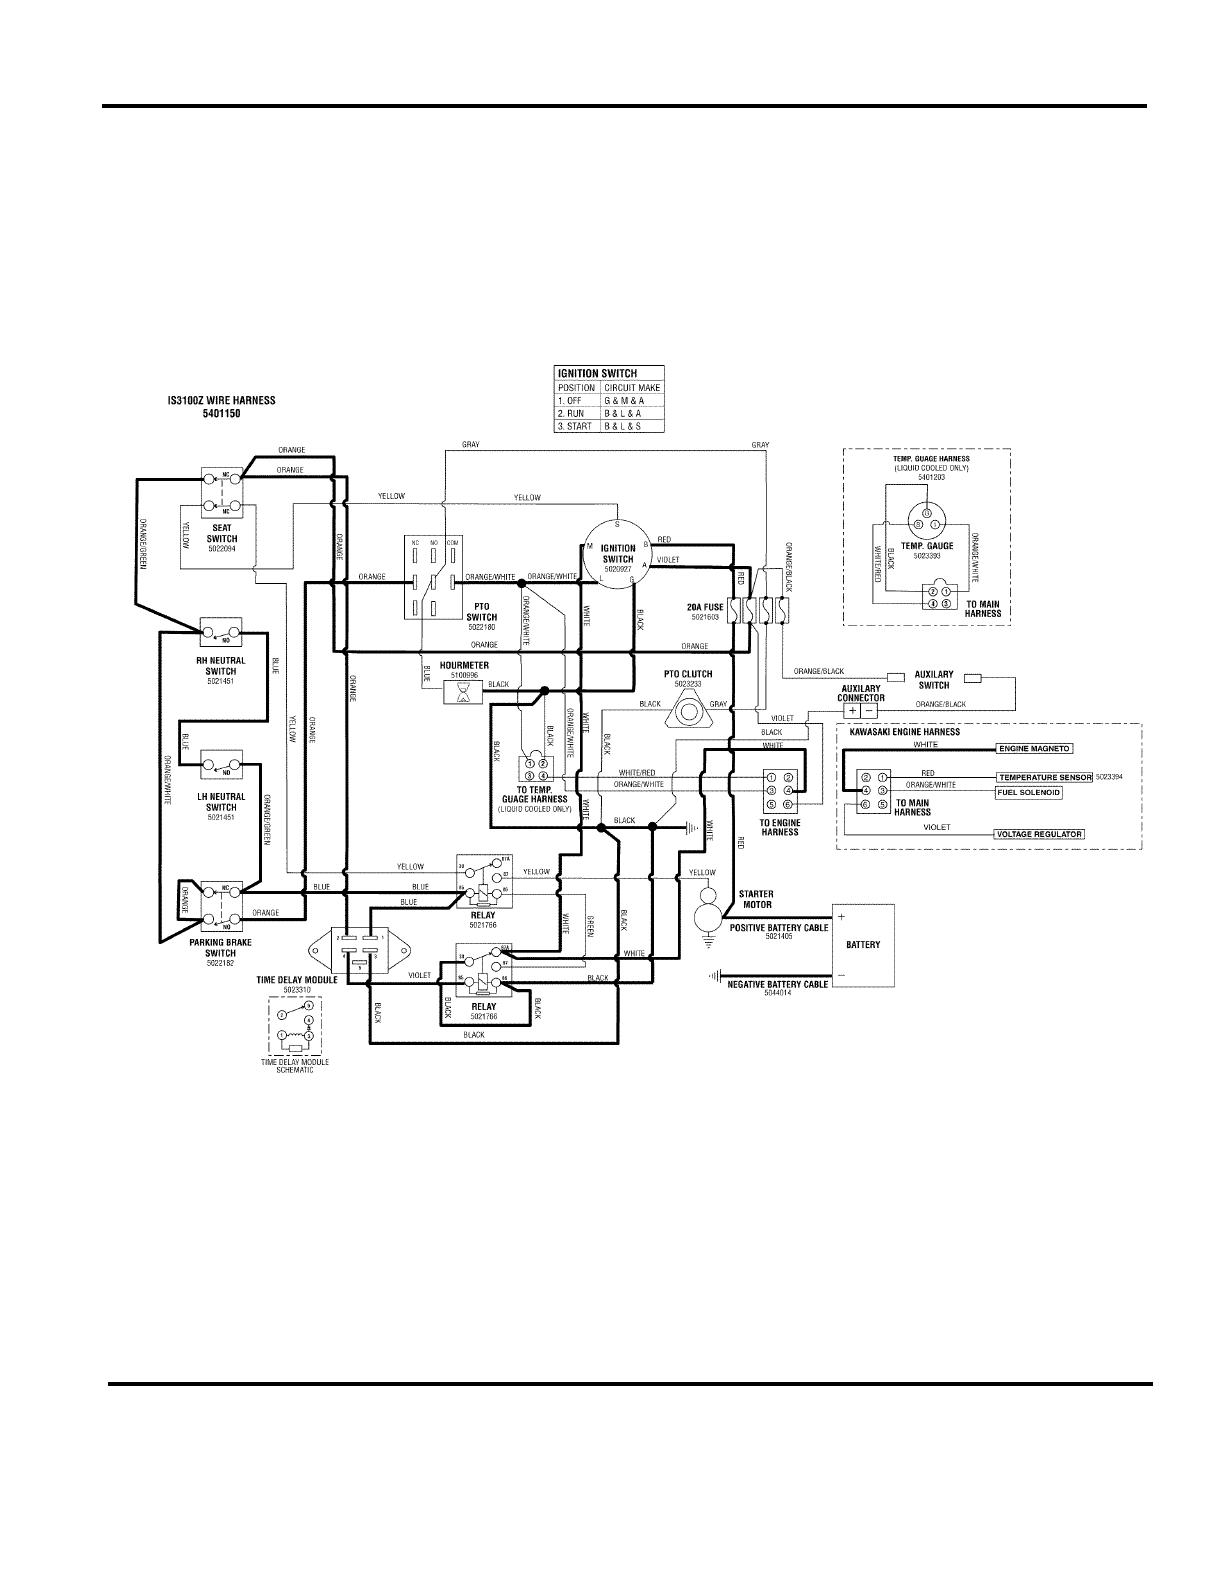 edko wiring diagram